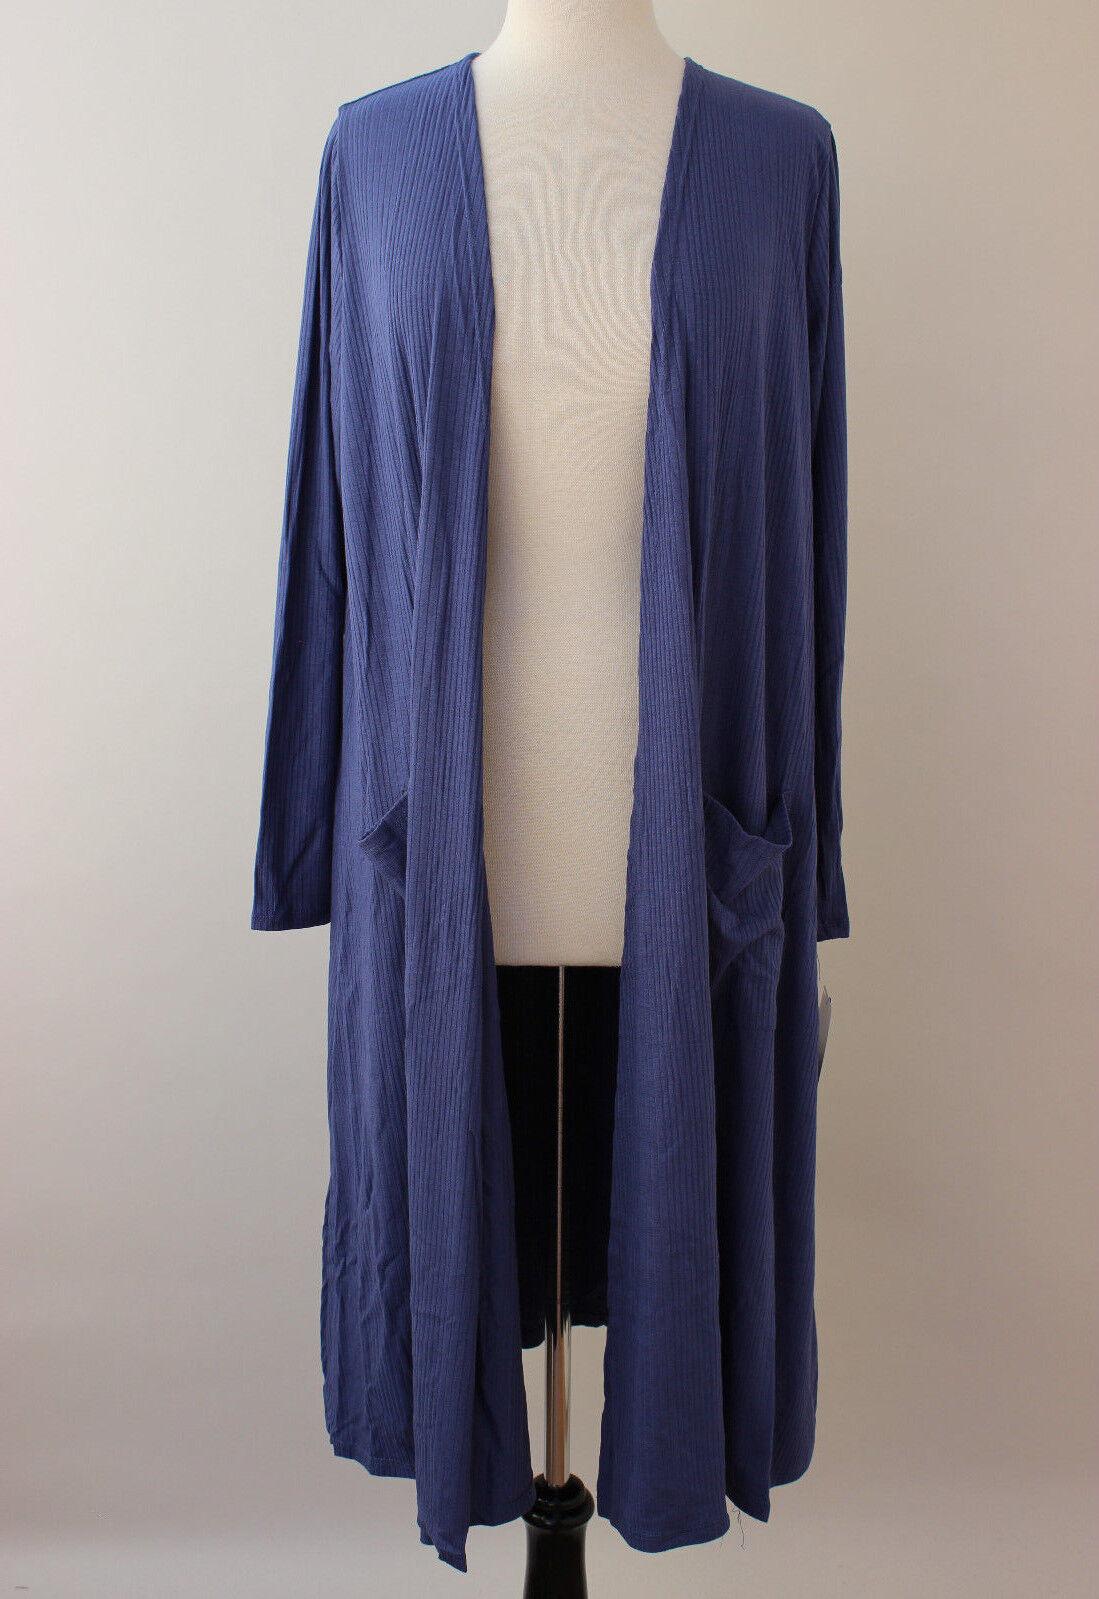 Medium LuLaRoe Sarah Duster Cardigan Solid Dark bluee Stretchy Ribbed NWT 124